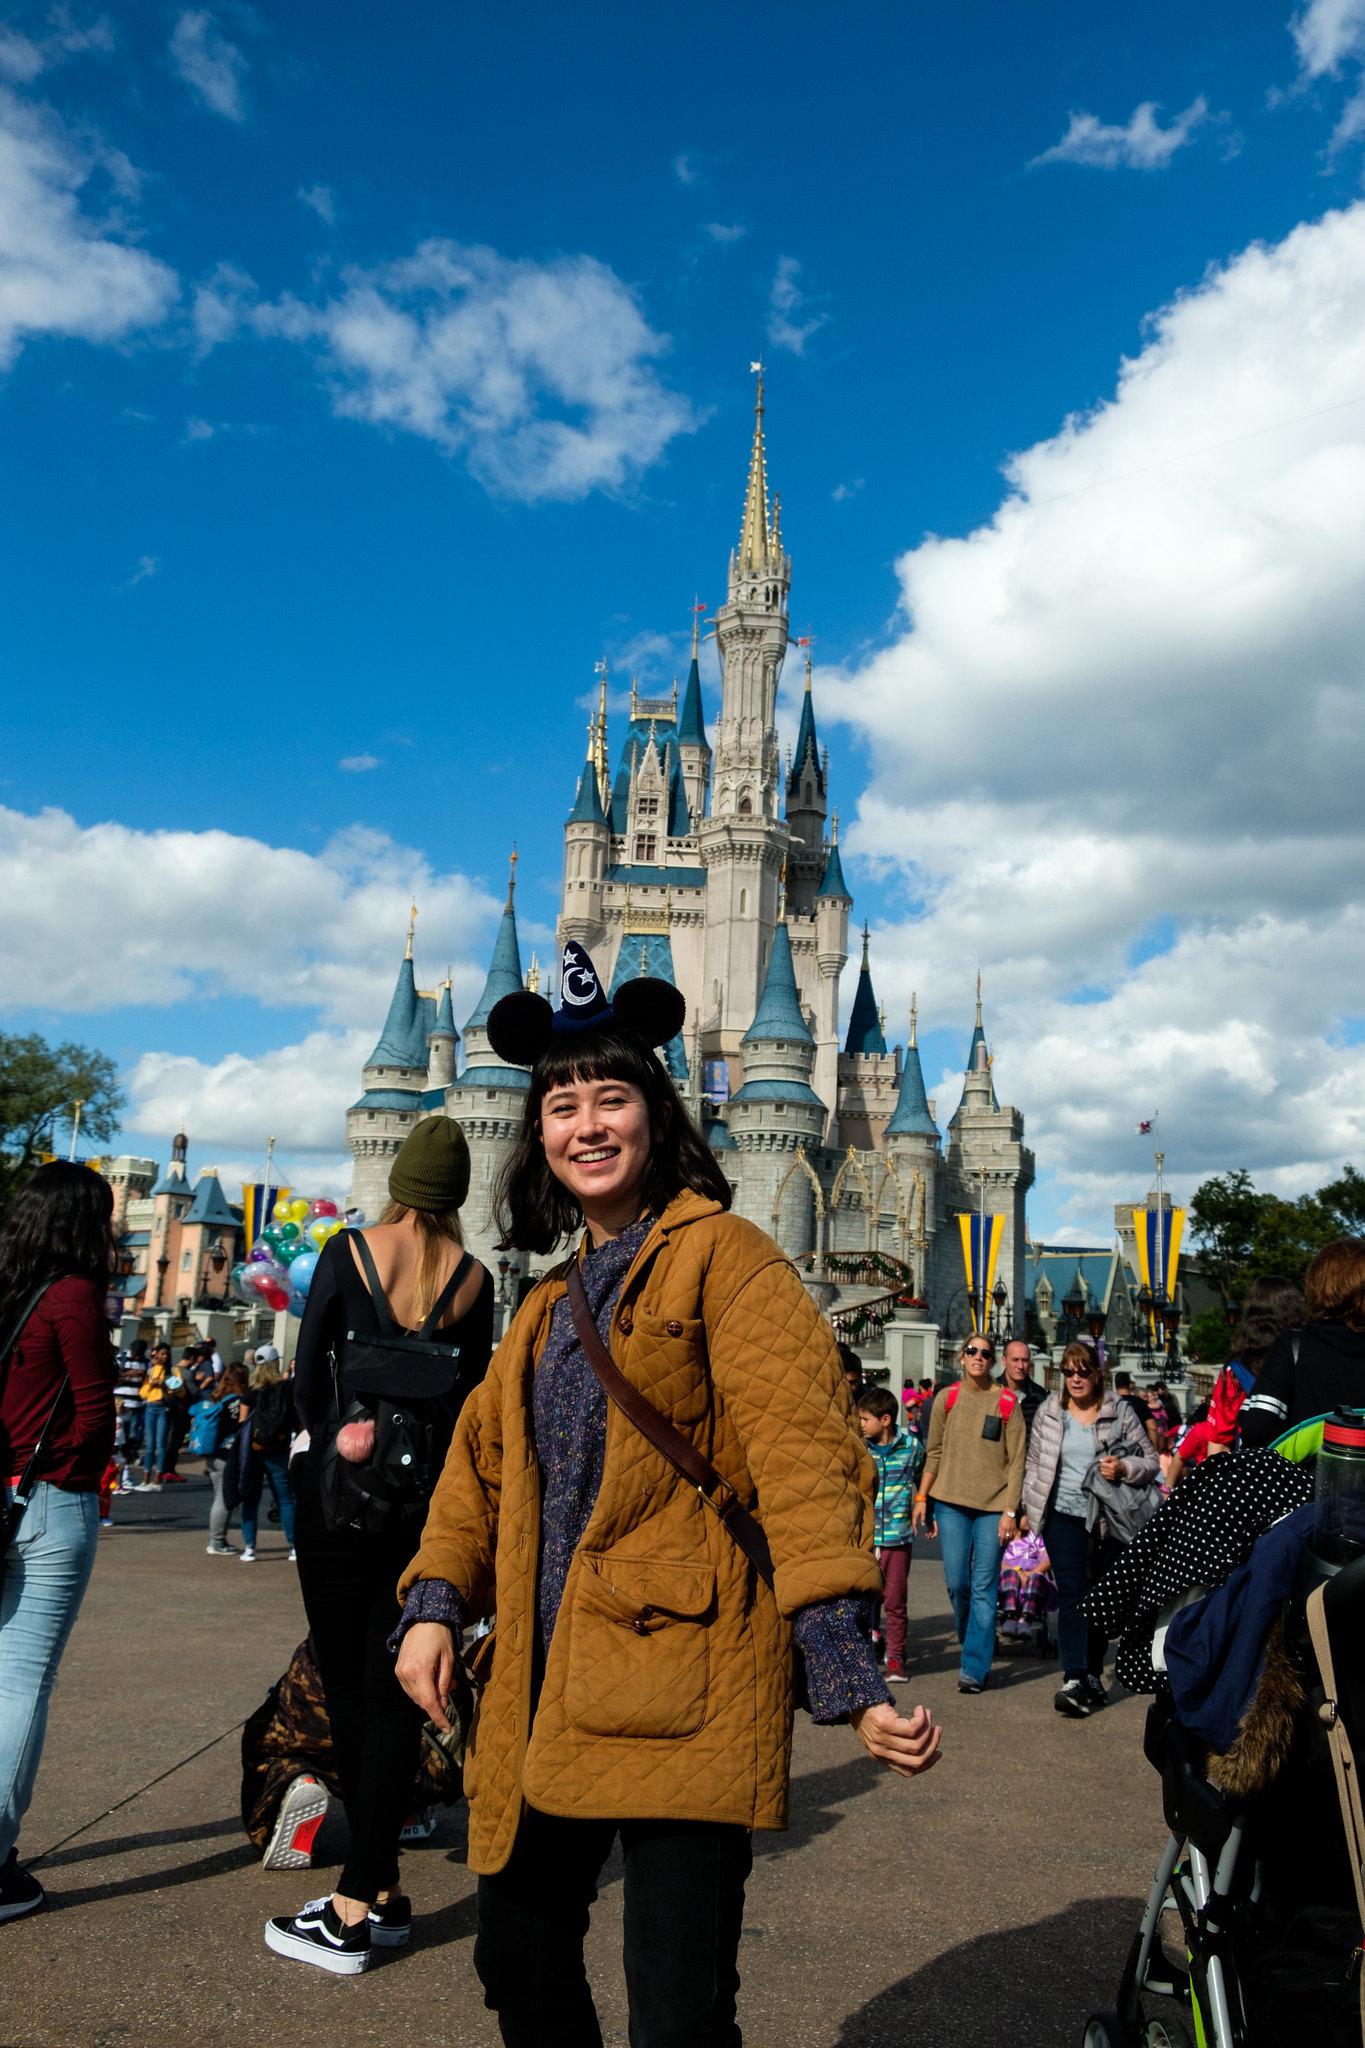 Disneyworld 2019